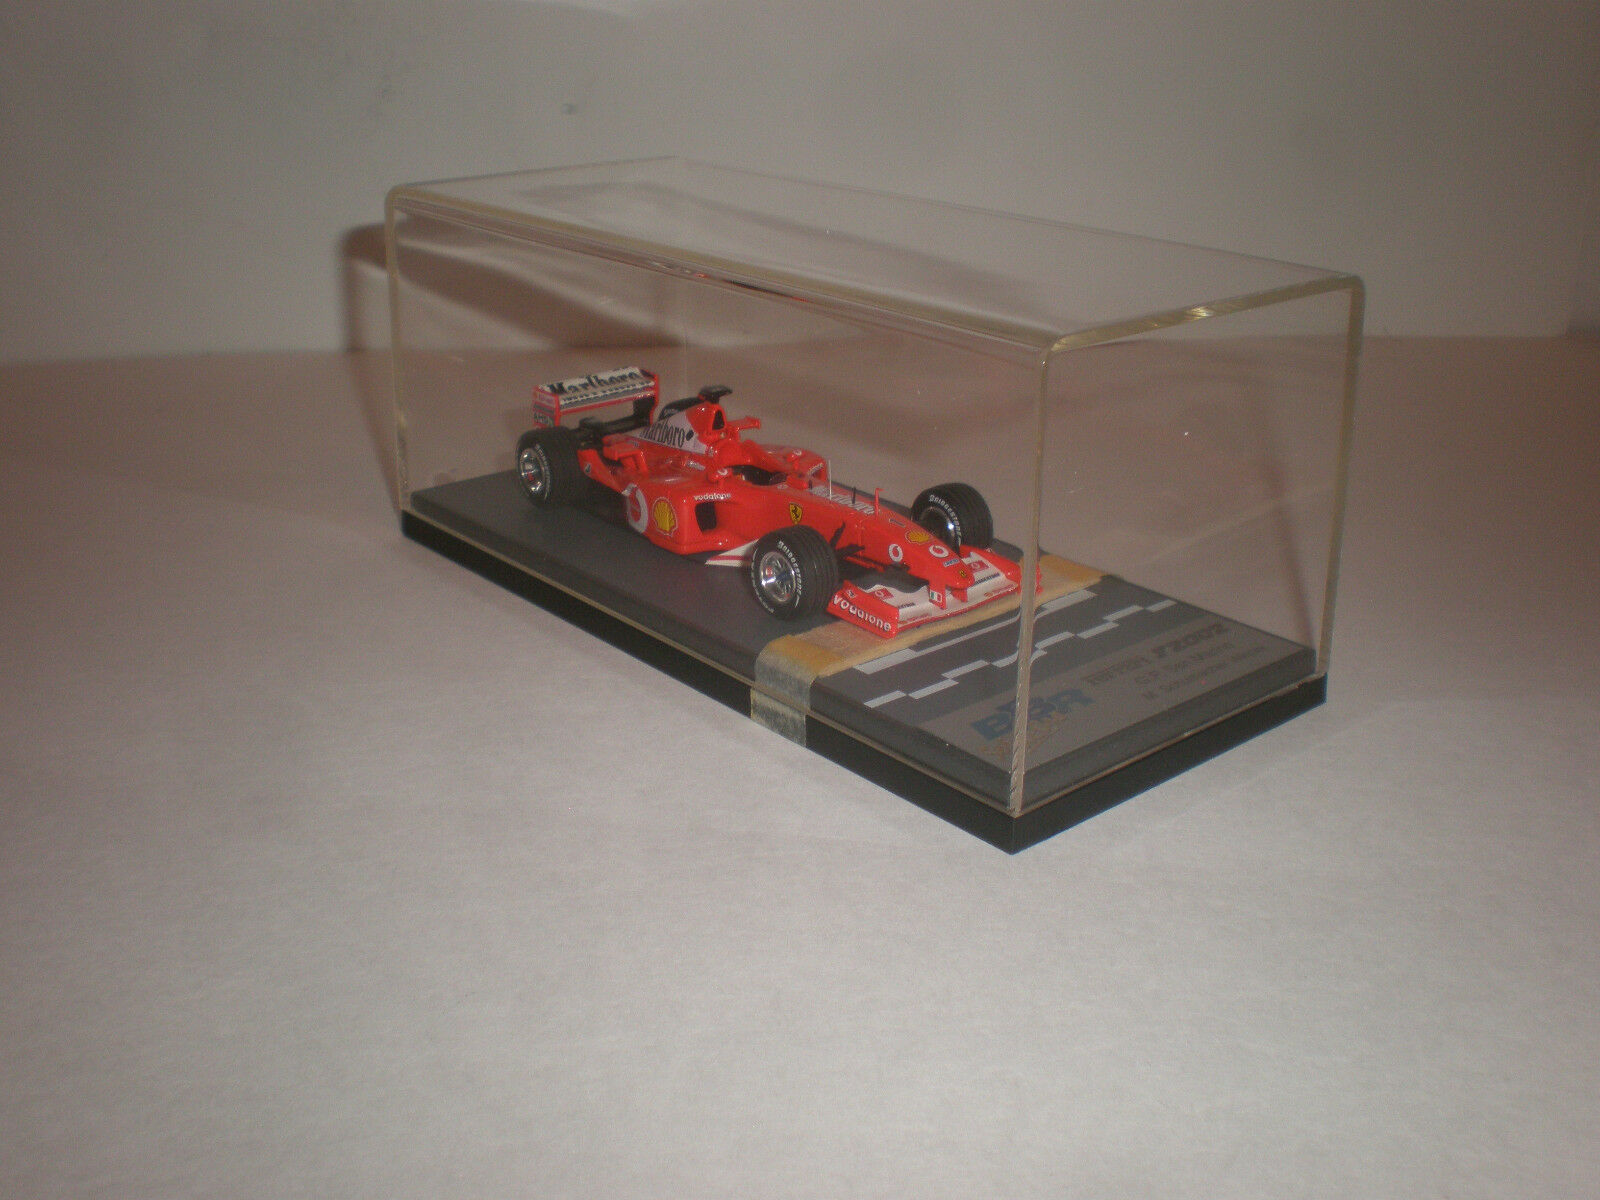 BBR Ferrari F1-2002 Grand Prix San Marino 2002 ganador M. Schumacher BG233